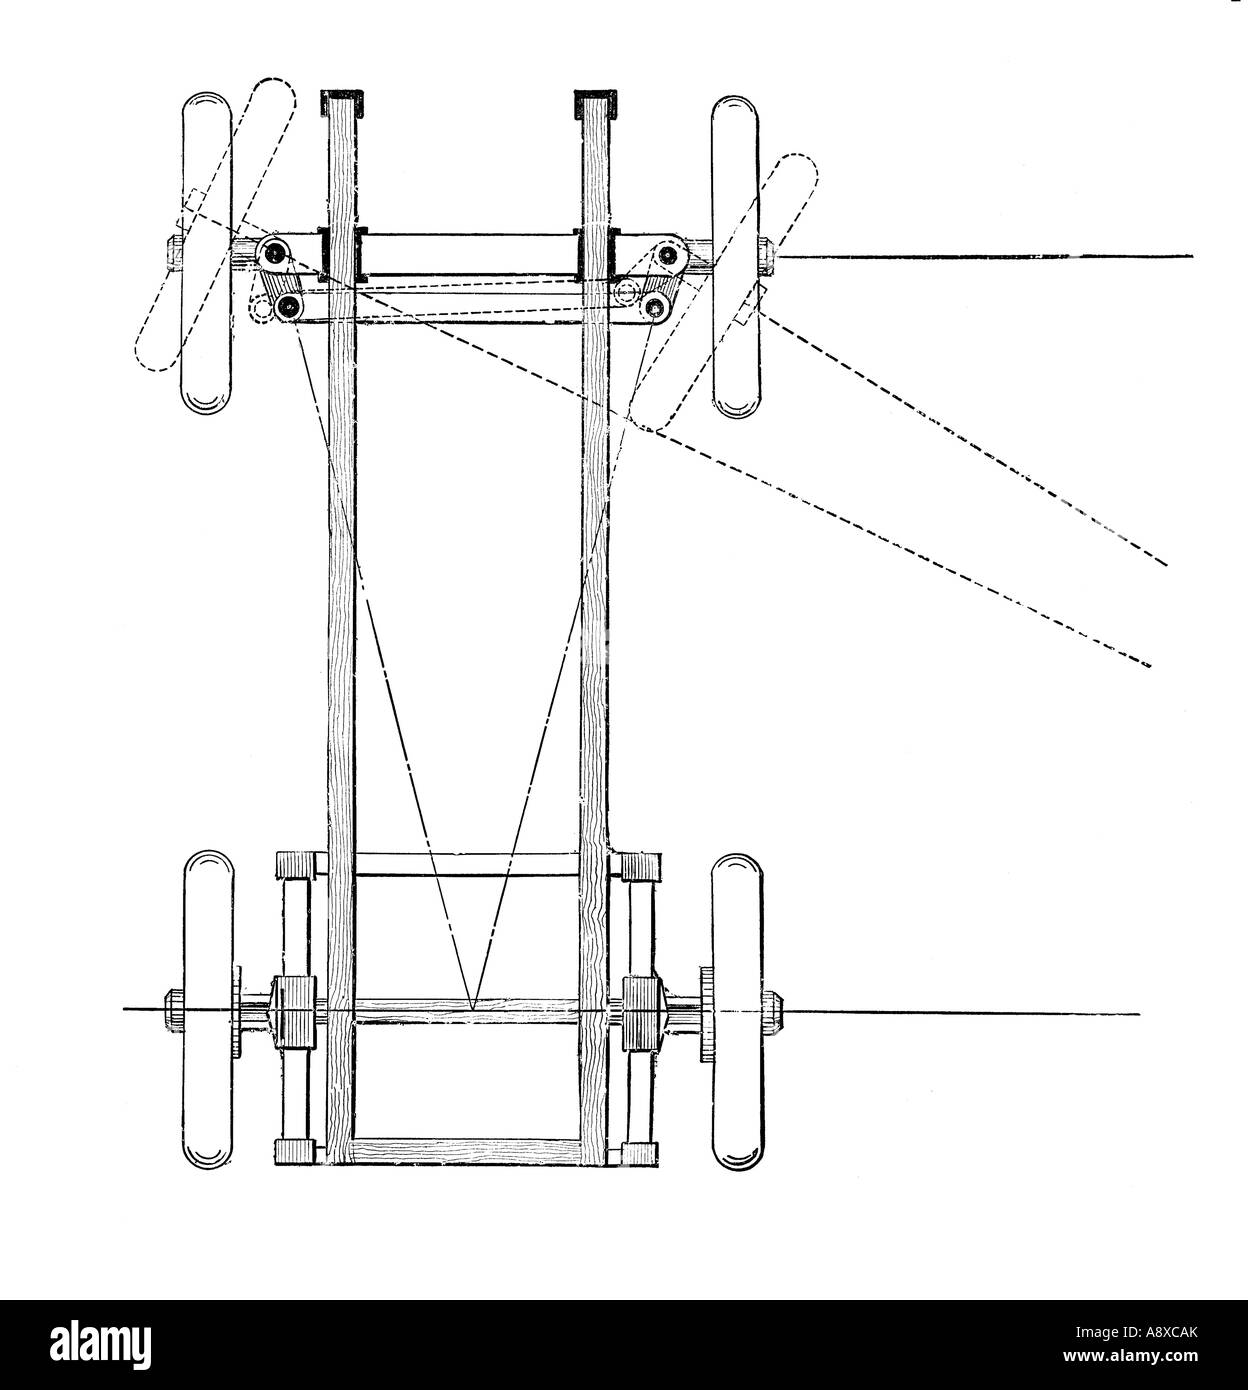 Car Steering System Diagram : Steering system diagram pixshark images